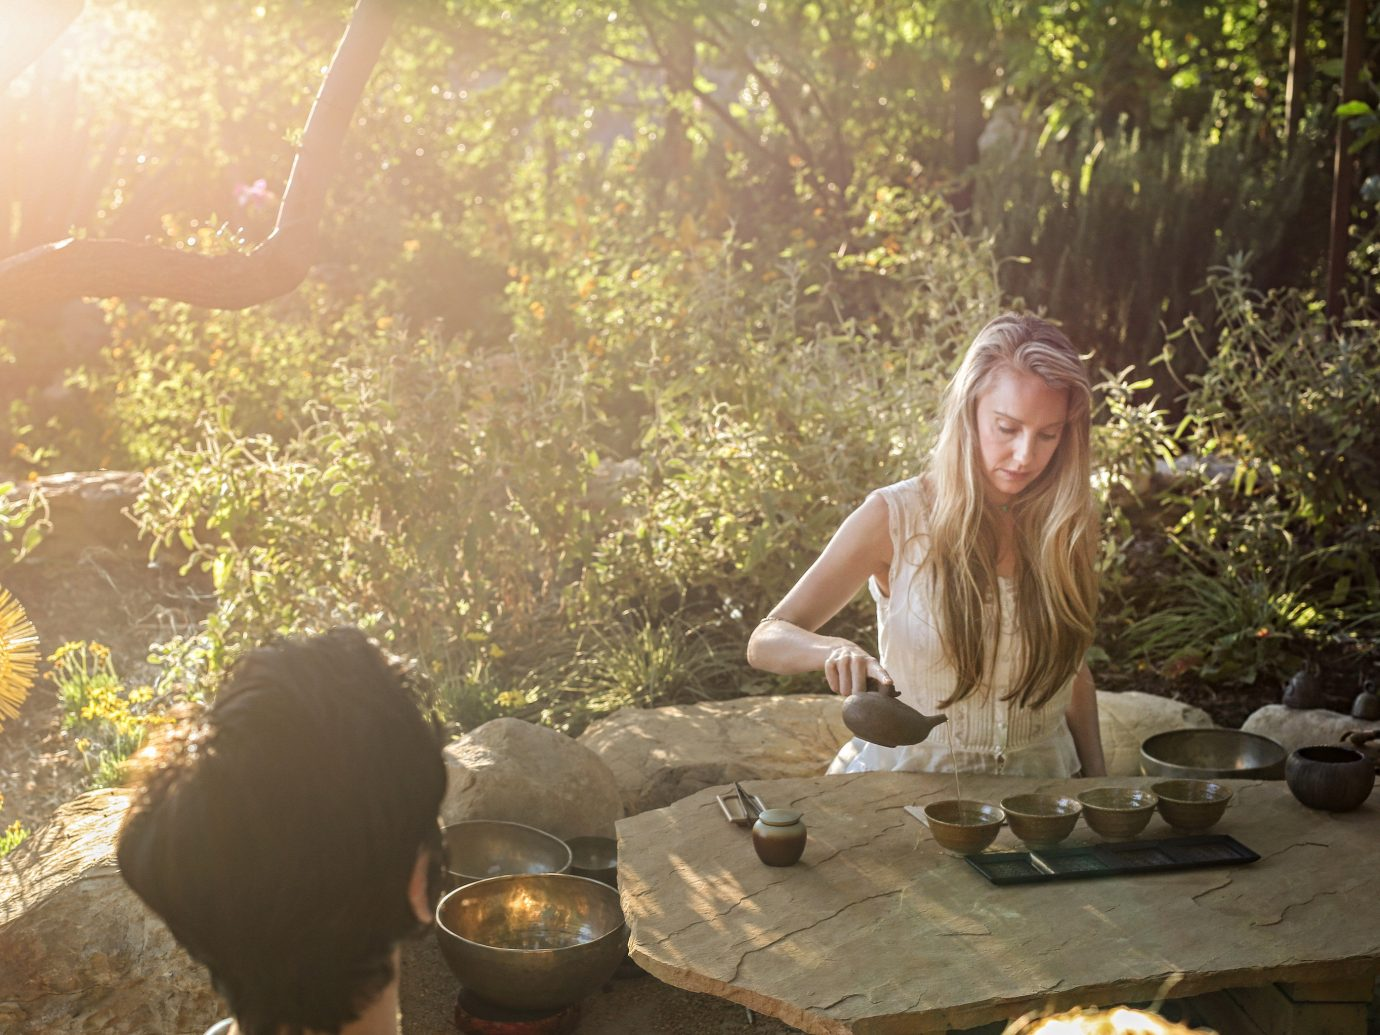 Health + Wellness Meditation Retreats Offbeat Spa Retreats Yoga Retreats tree person outdoor sunlight temple flower autumn